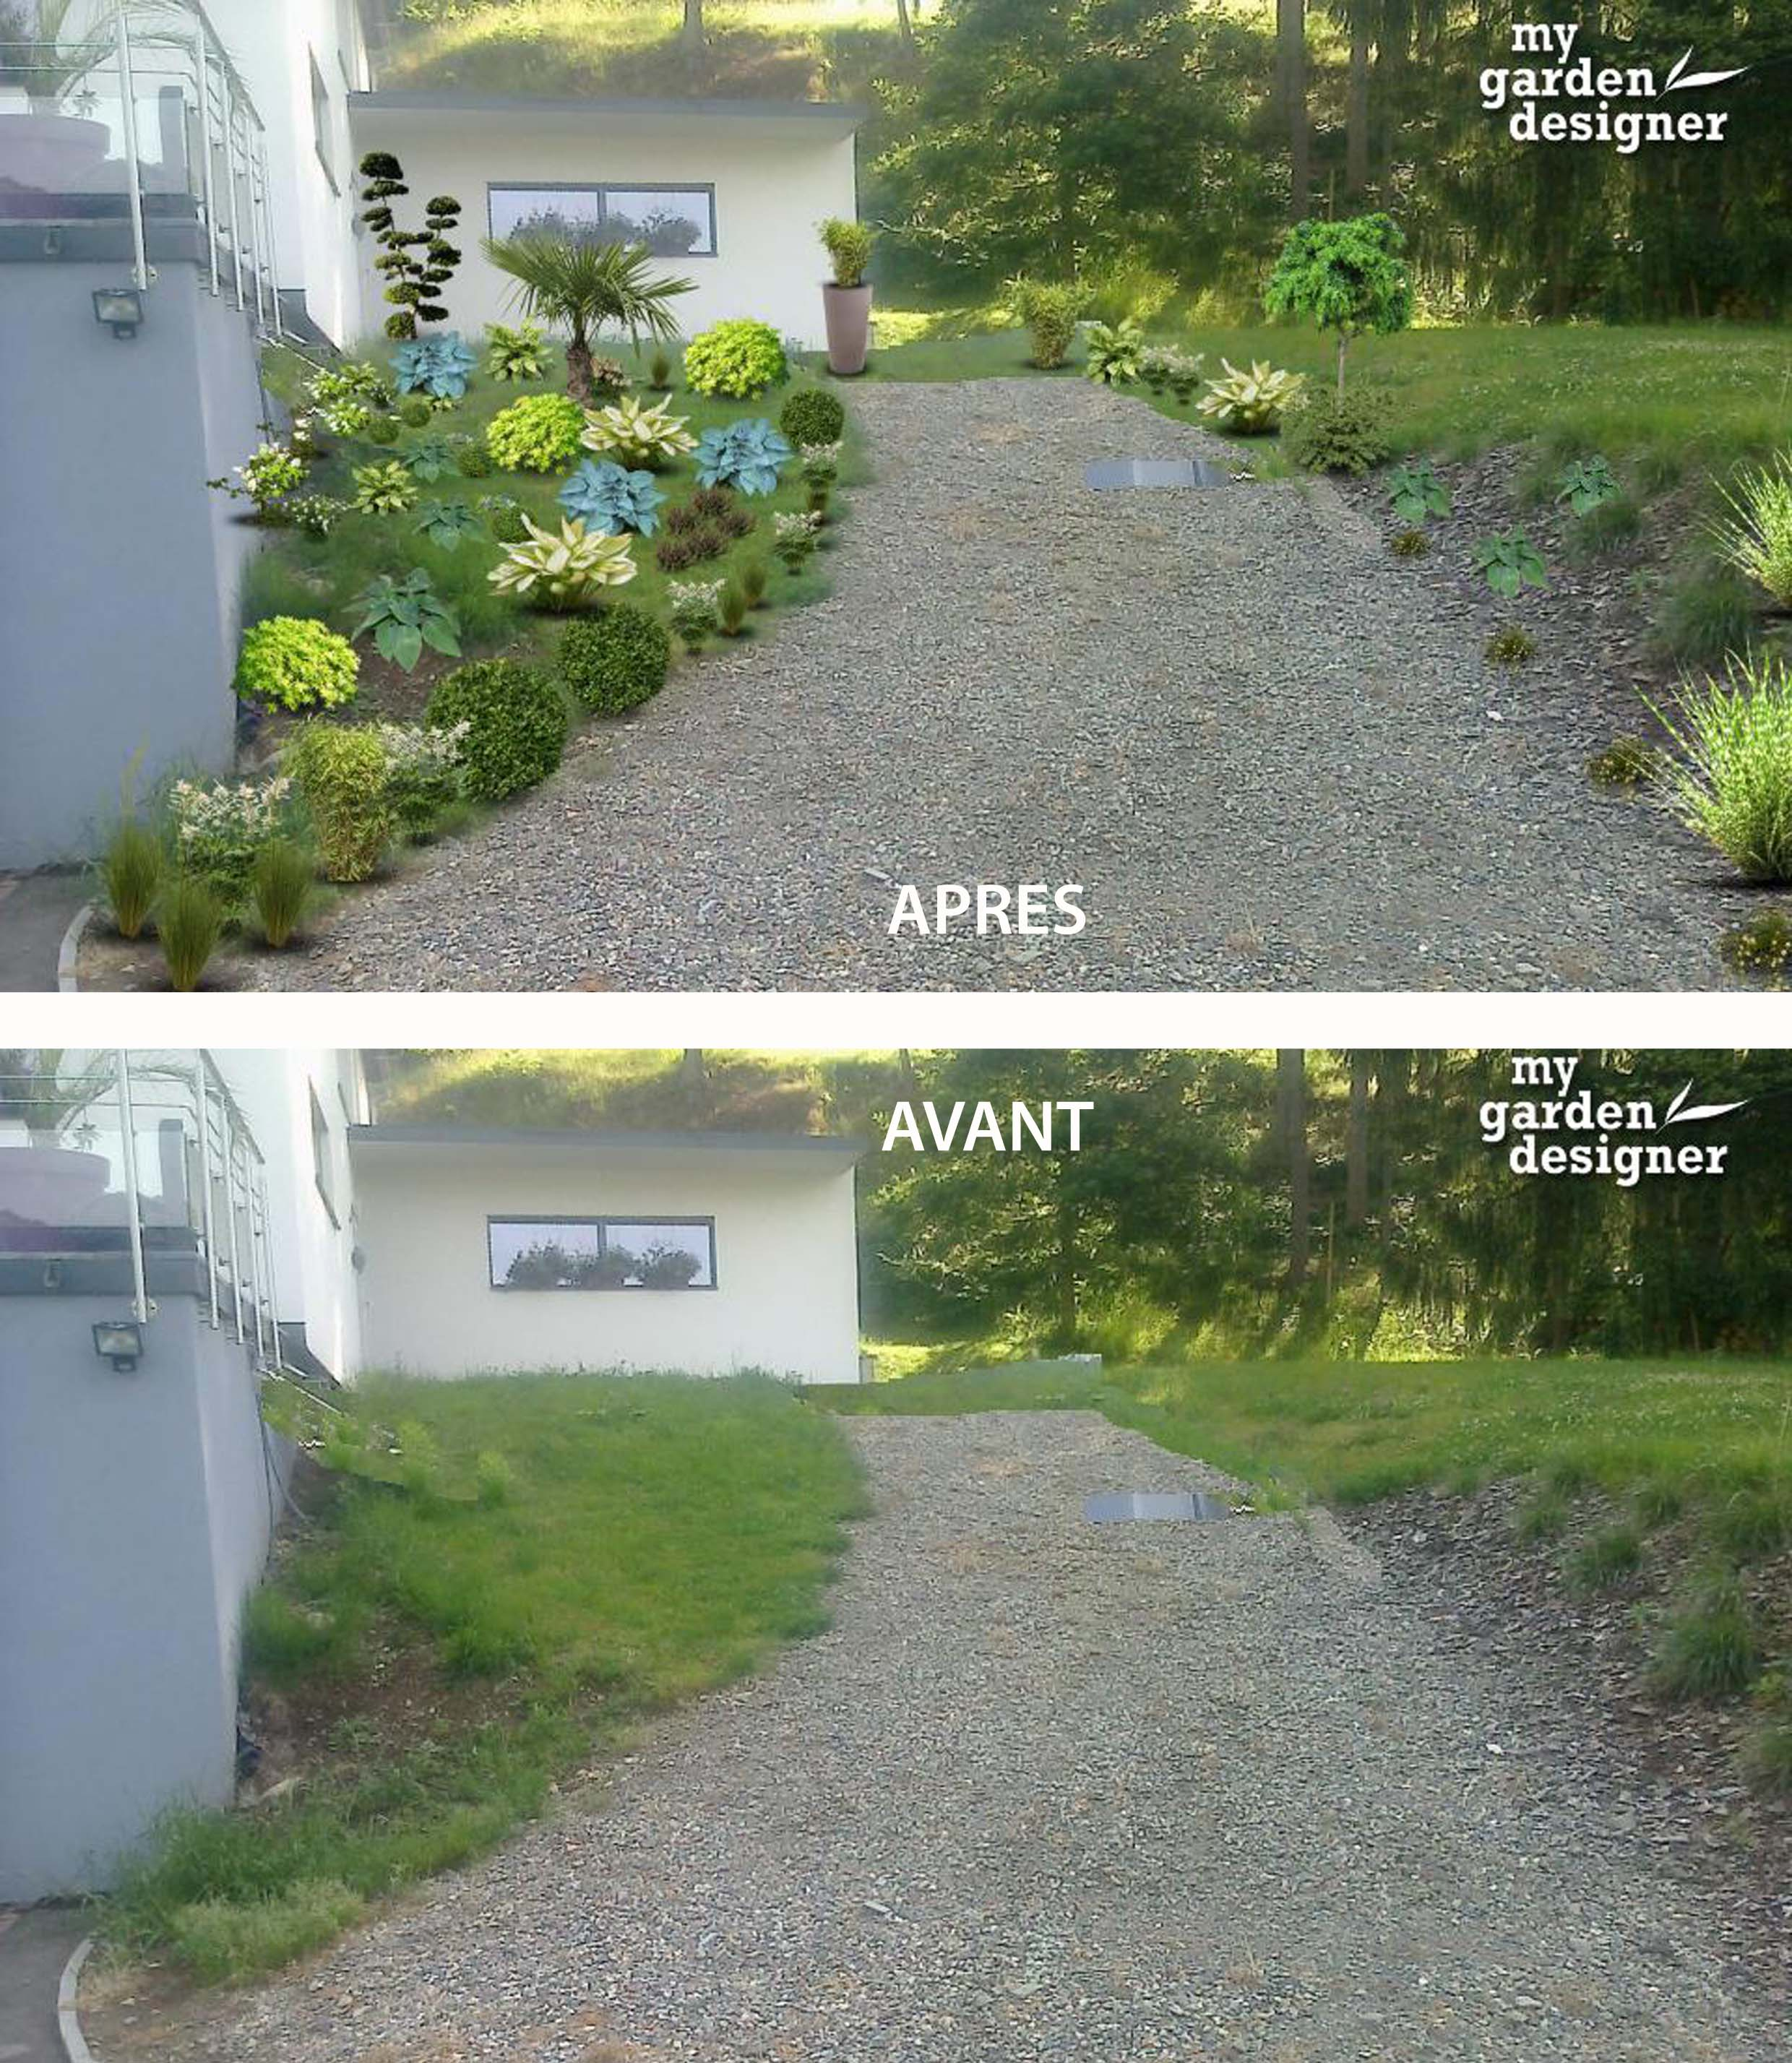 aménager un terrain en pente ombragé | monjardin-materrasse.com